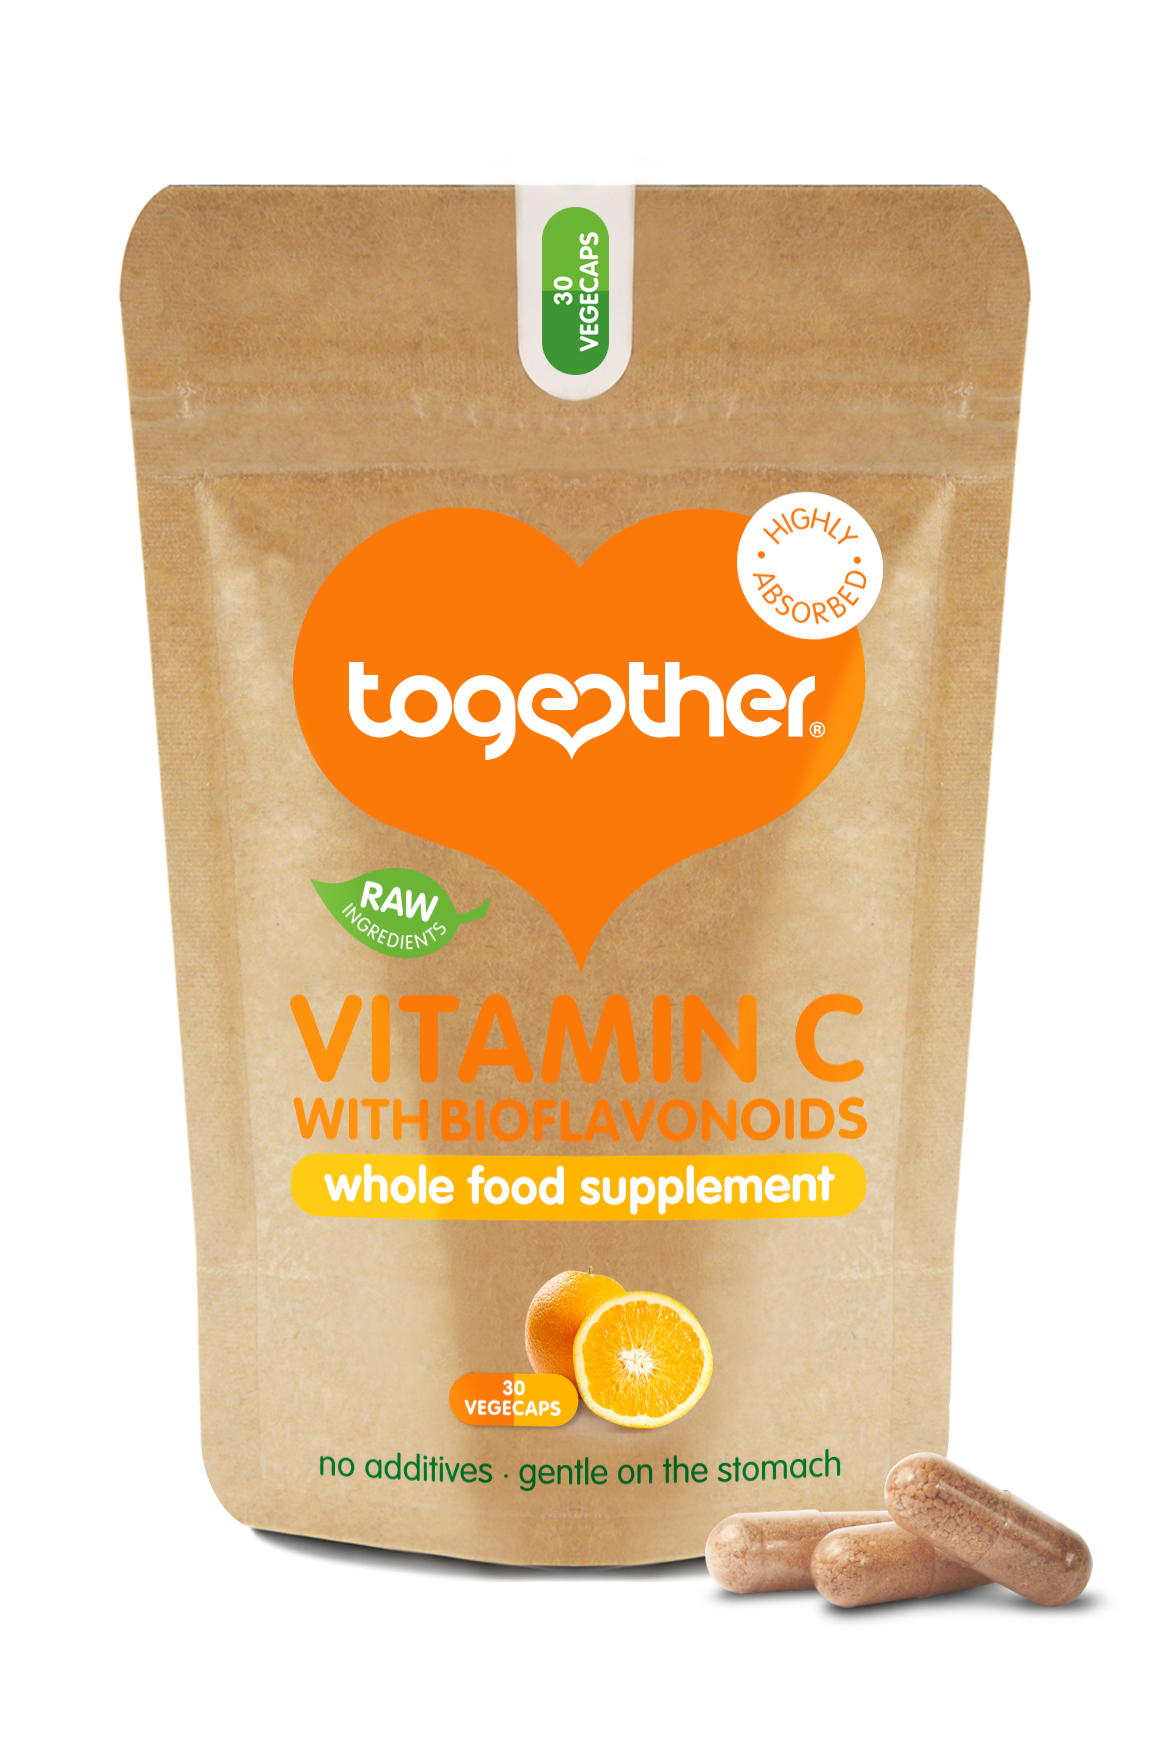 Vitamin C with Bioflavonoids 30's